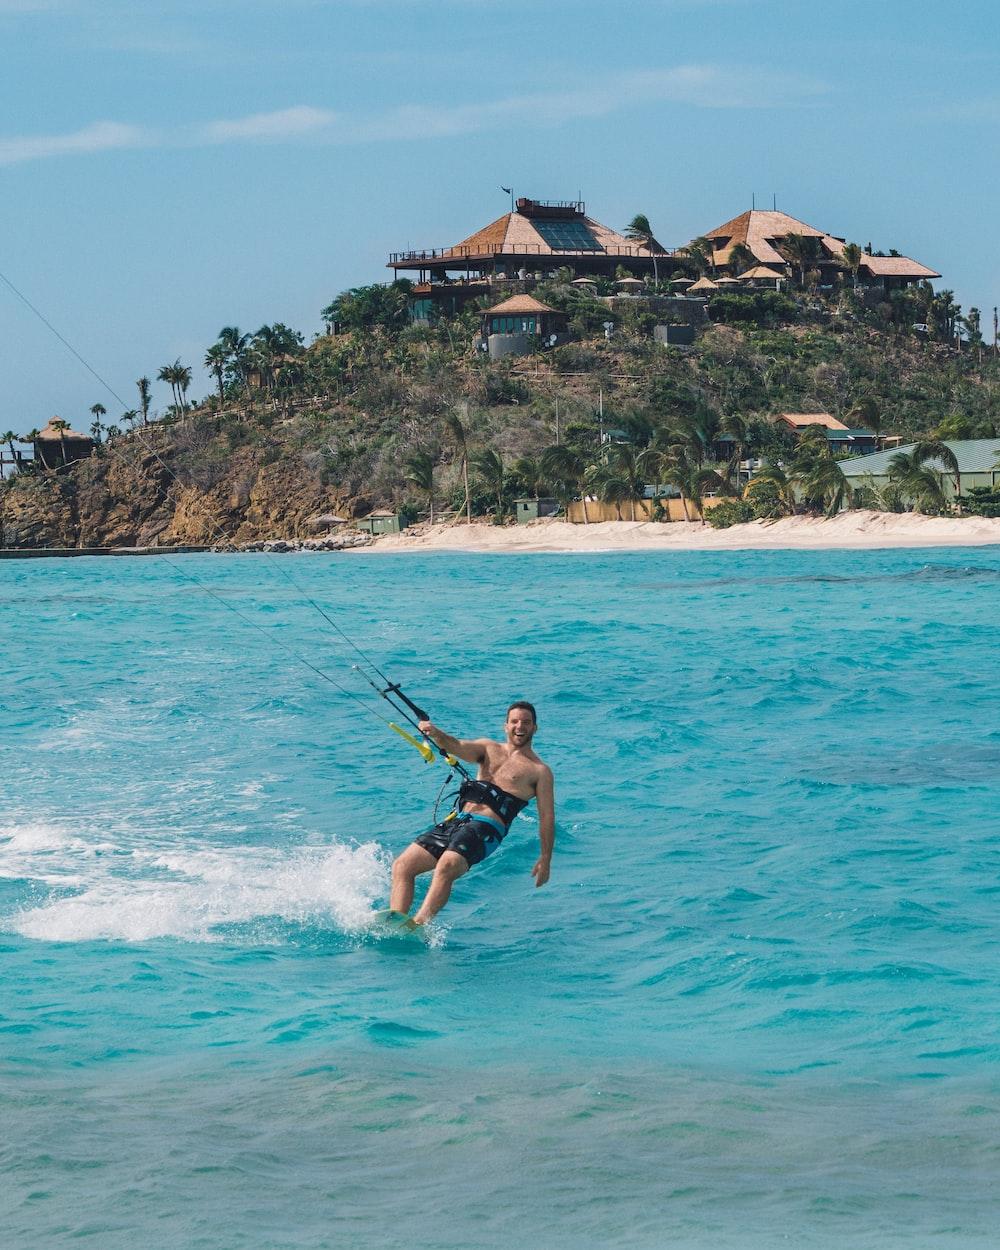 man playing windsurfing board